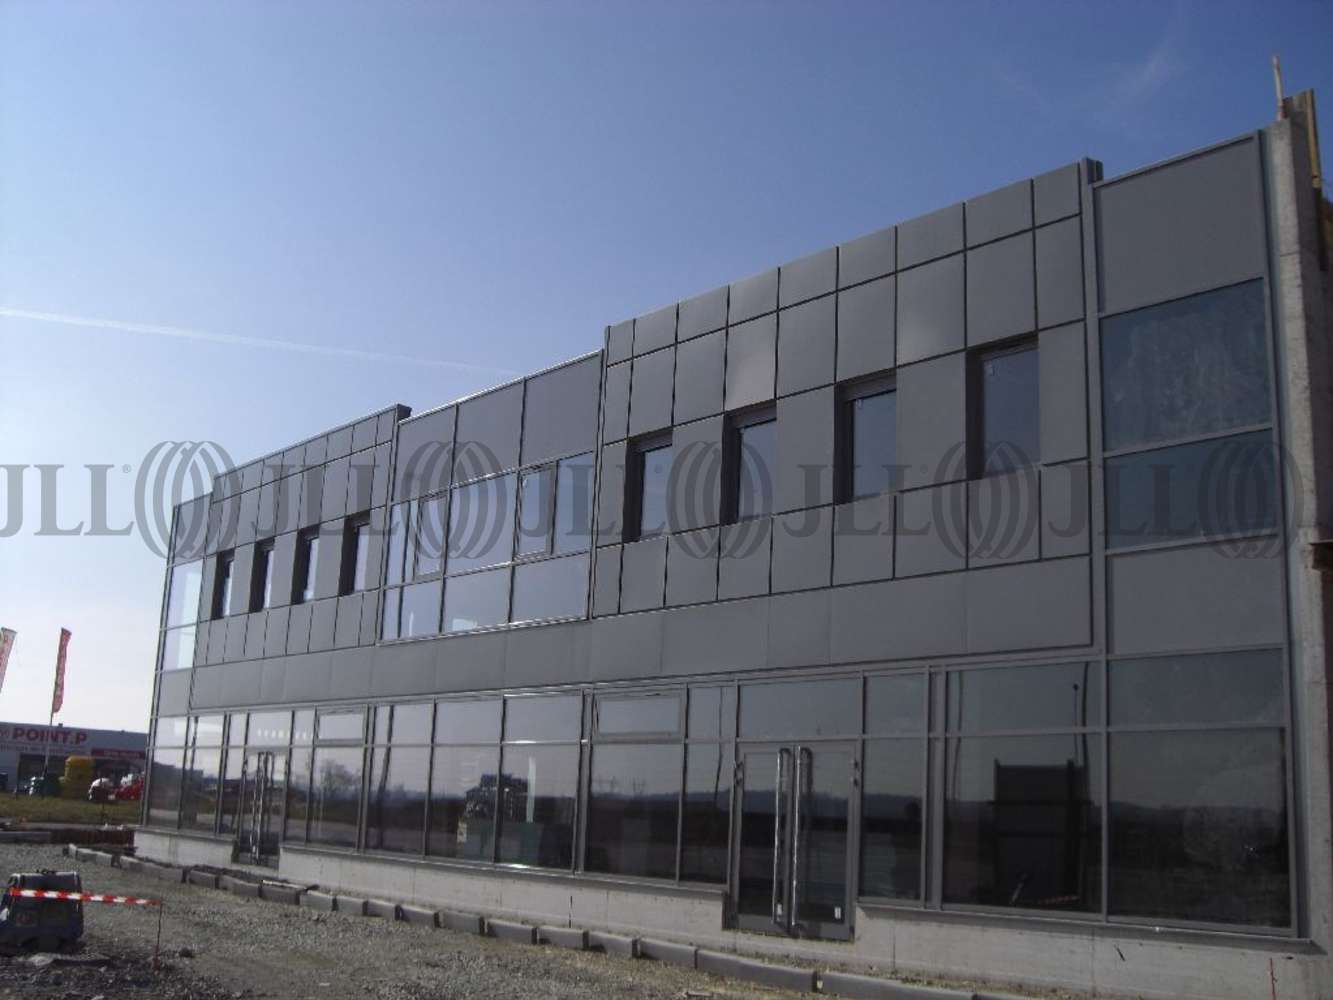 Activités/entrepôt Arnas, 69400 - LOCATION LOCAUX D ACTIVITE LYON NORD - 9873000